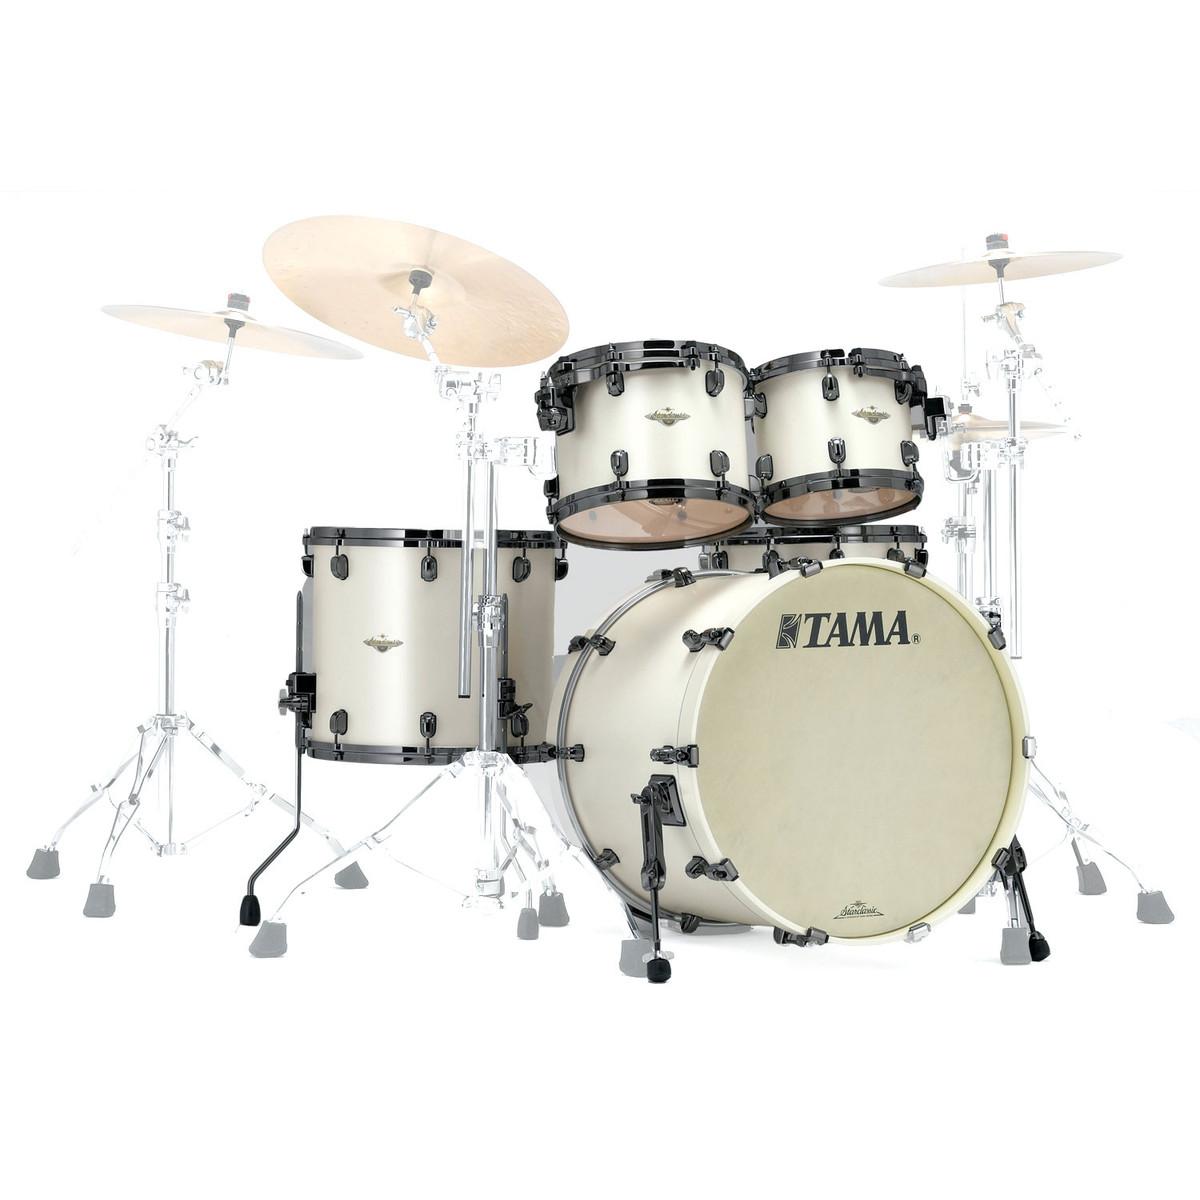 tama starclassic bubinga 22 39 39 4pc shell pack satin pearl white at gear4music. Black Bedroom Furniture Sets. Home Design Ideas